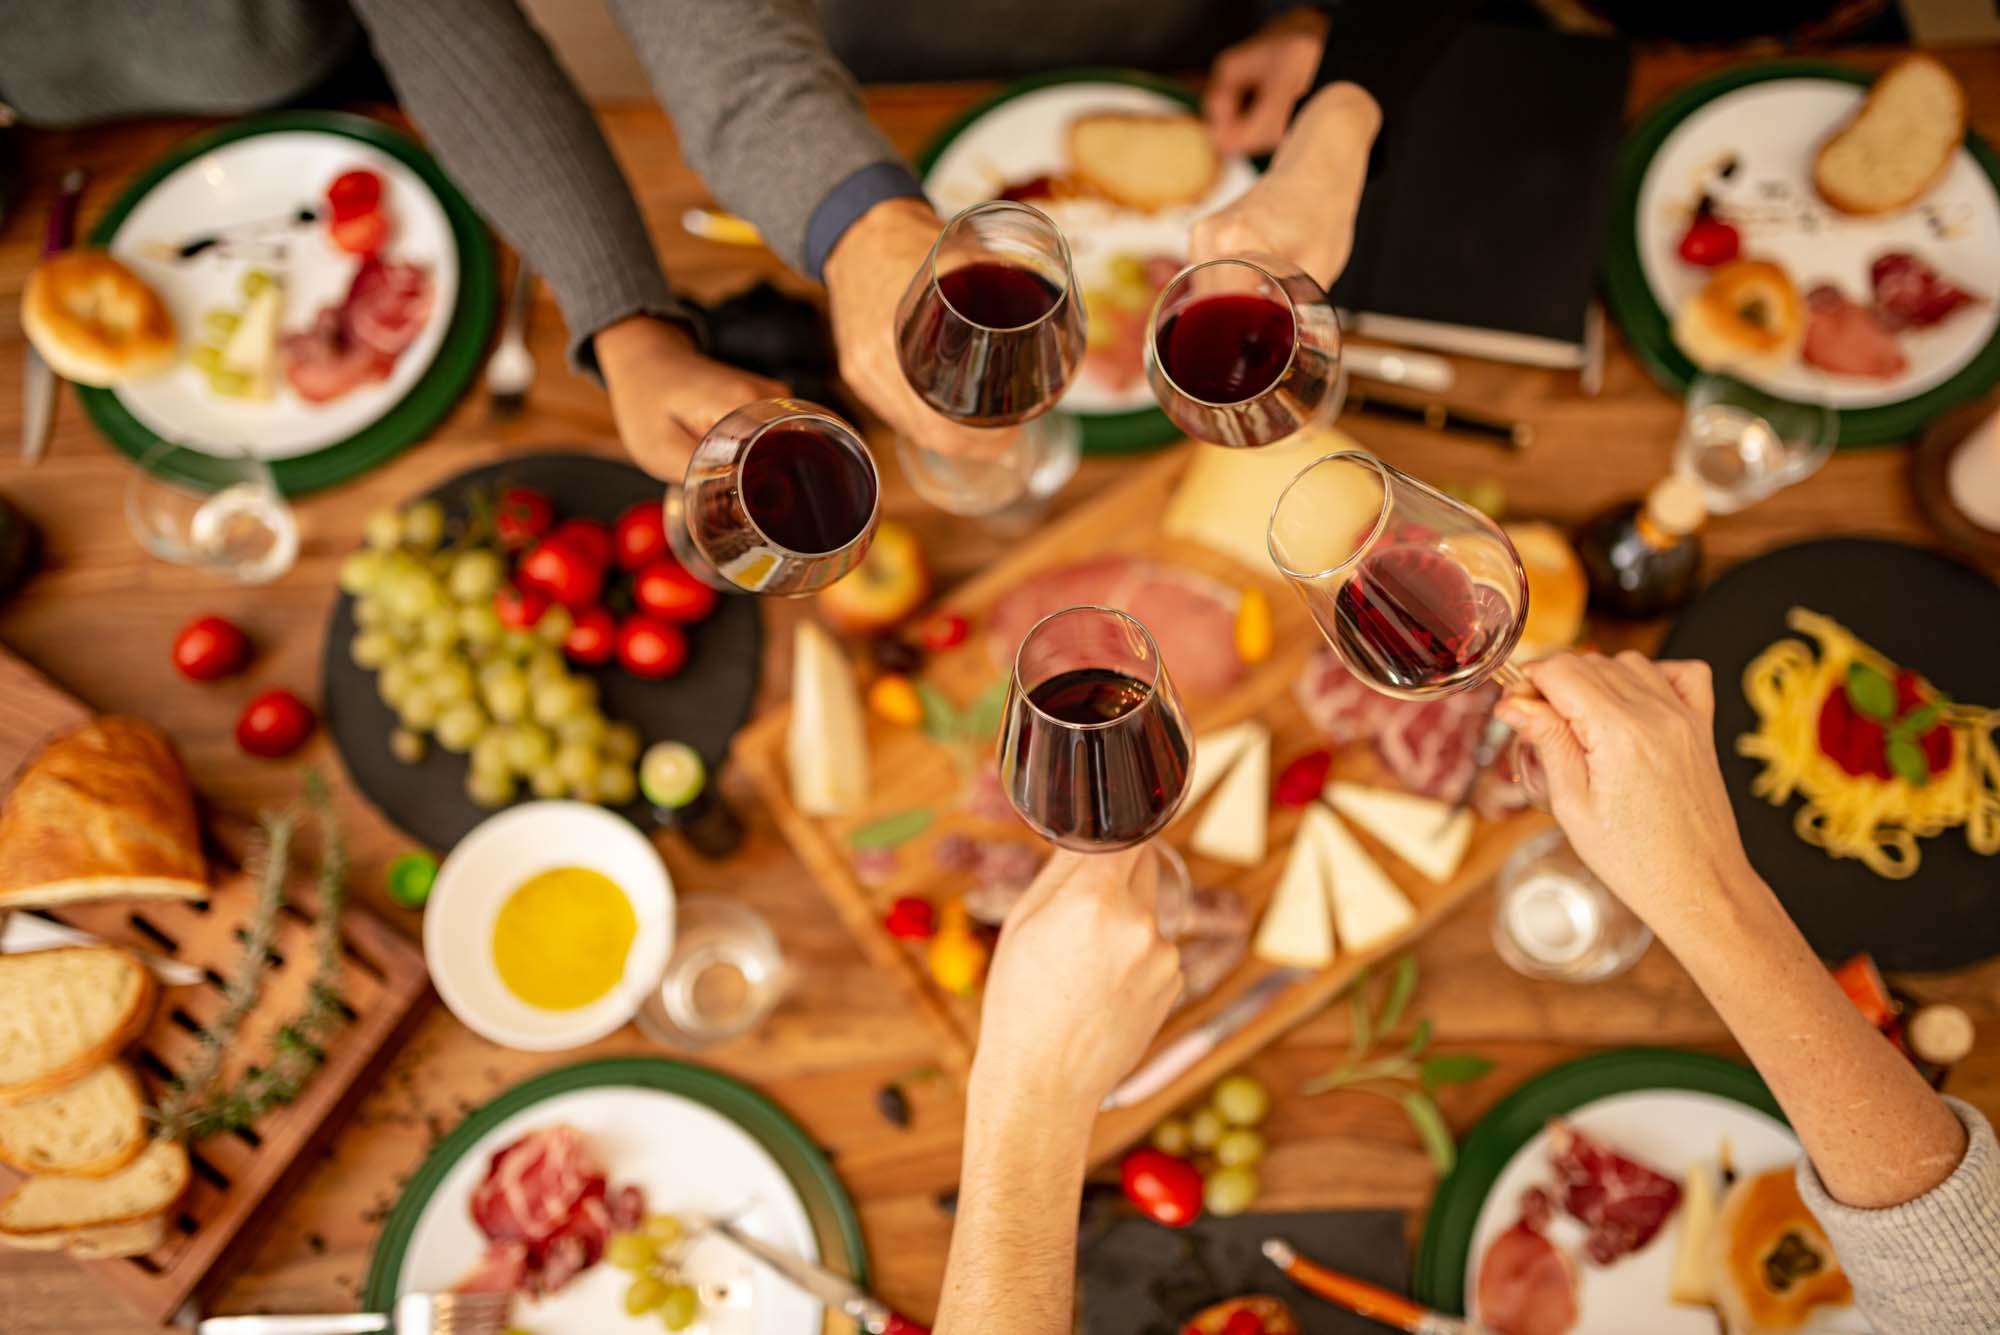 Corsi Di Cucina Eventi Aziendali a Brescia